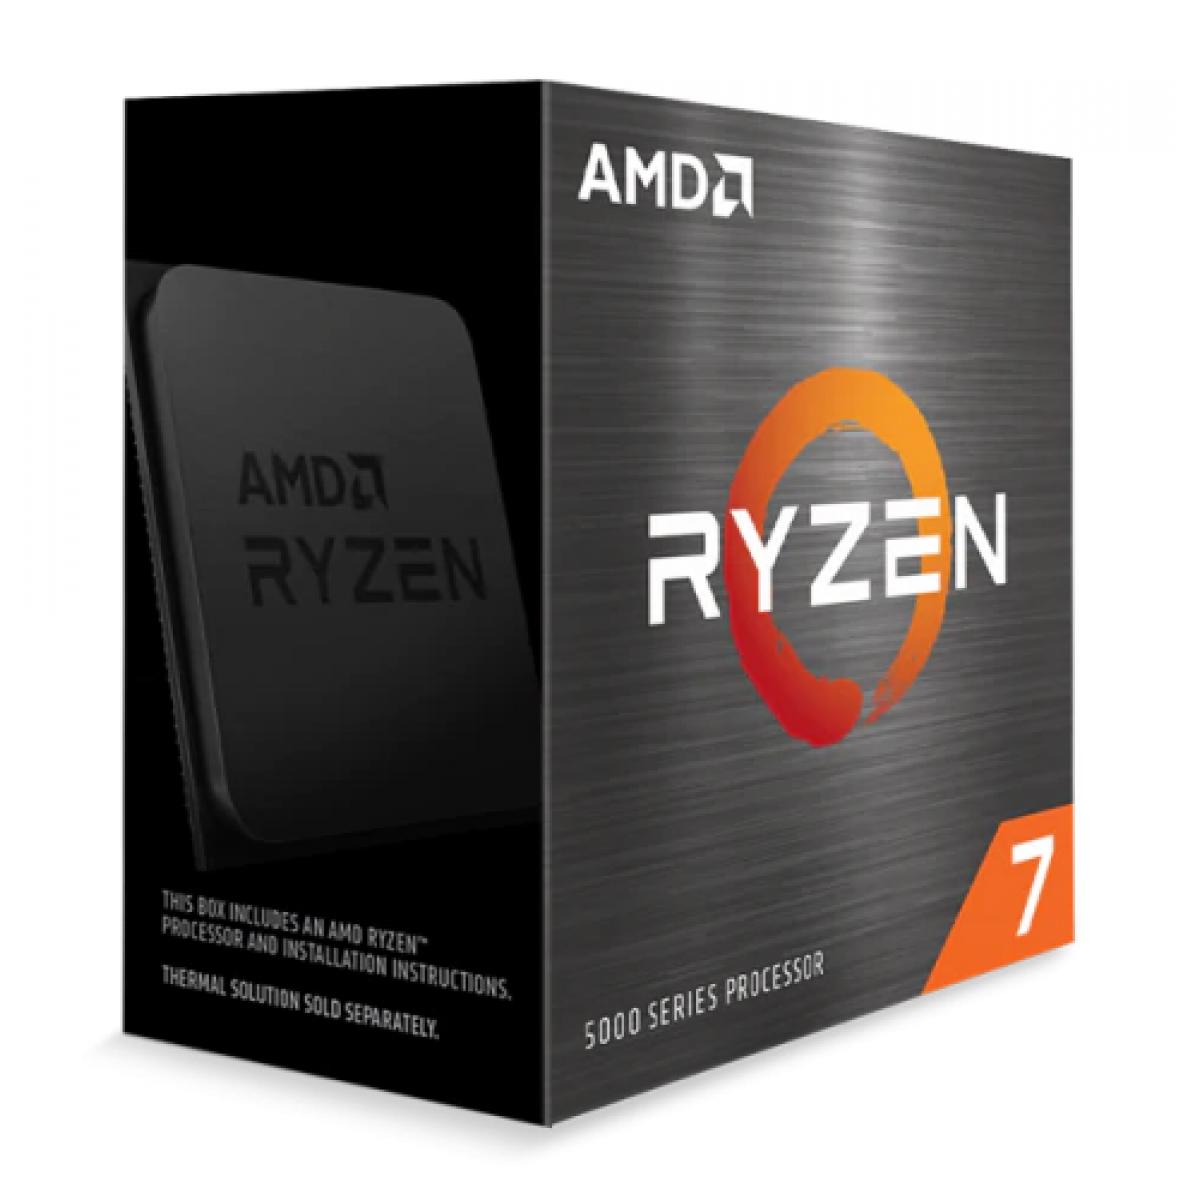 Kit Upgrade ASUS TUF GAMING RADEON RX 6900 XT + AMD Ryzen 7 5800X + Brinde Jogo Dirt 5